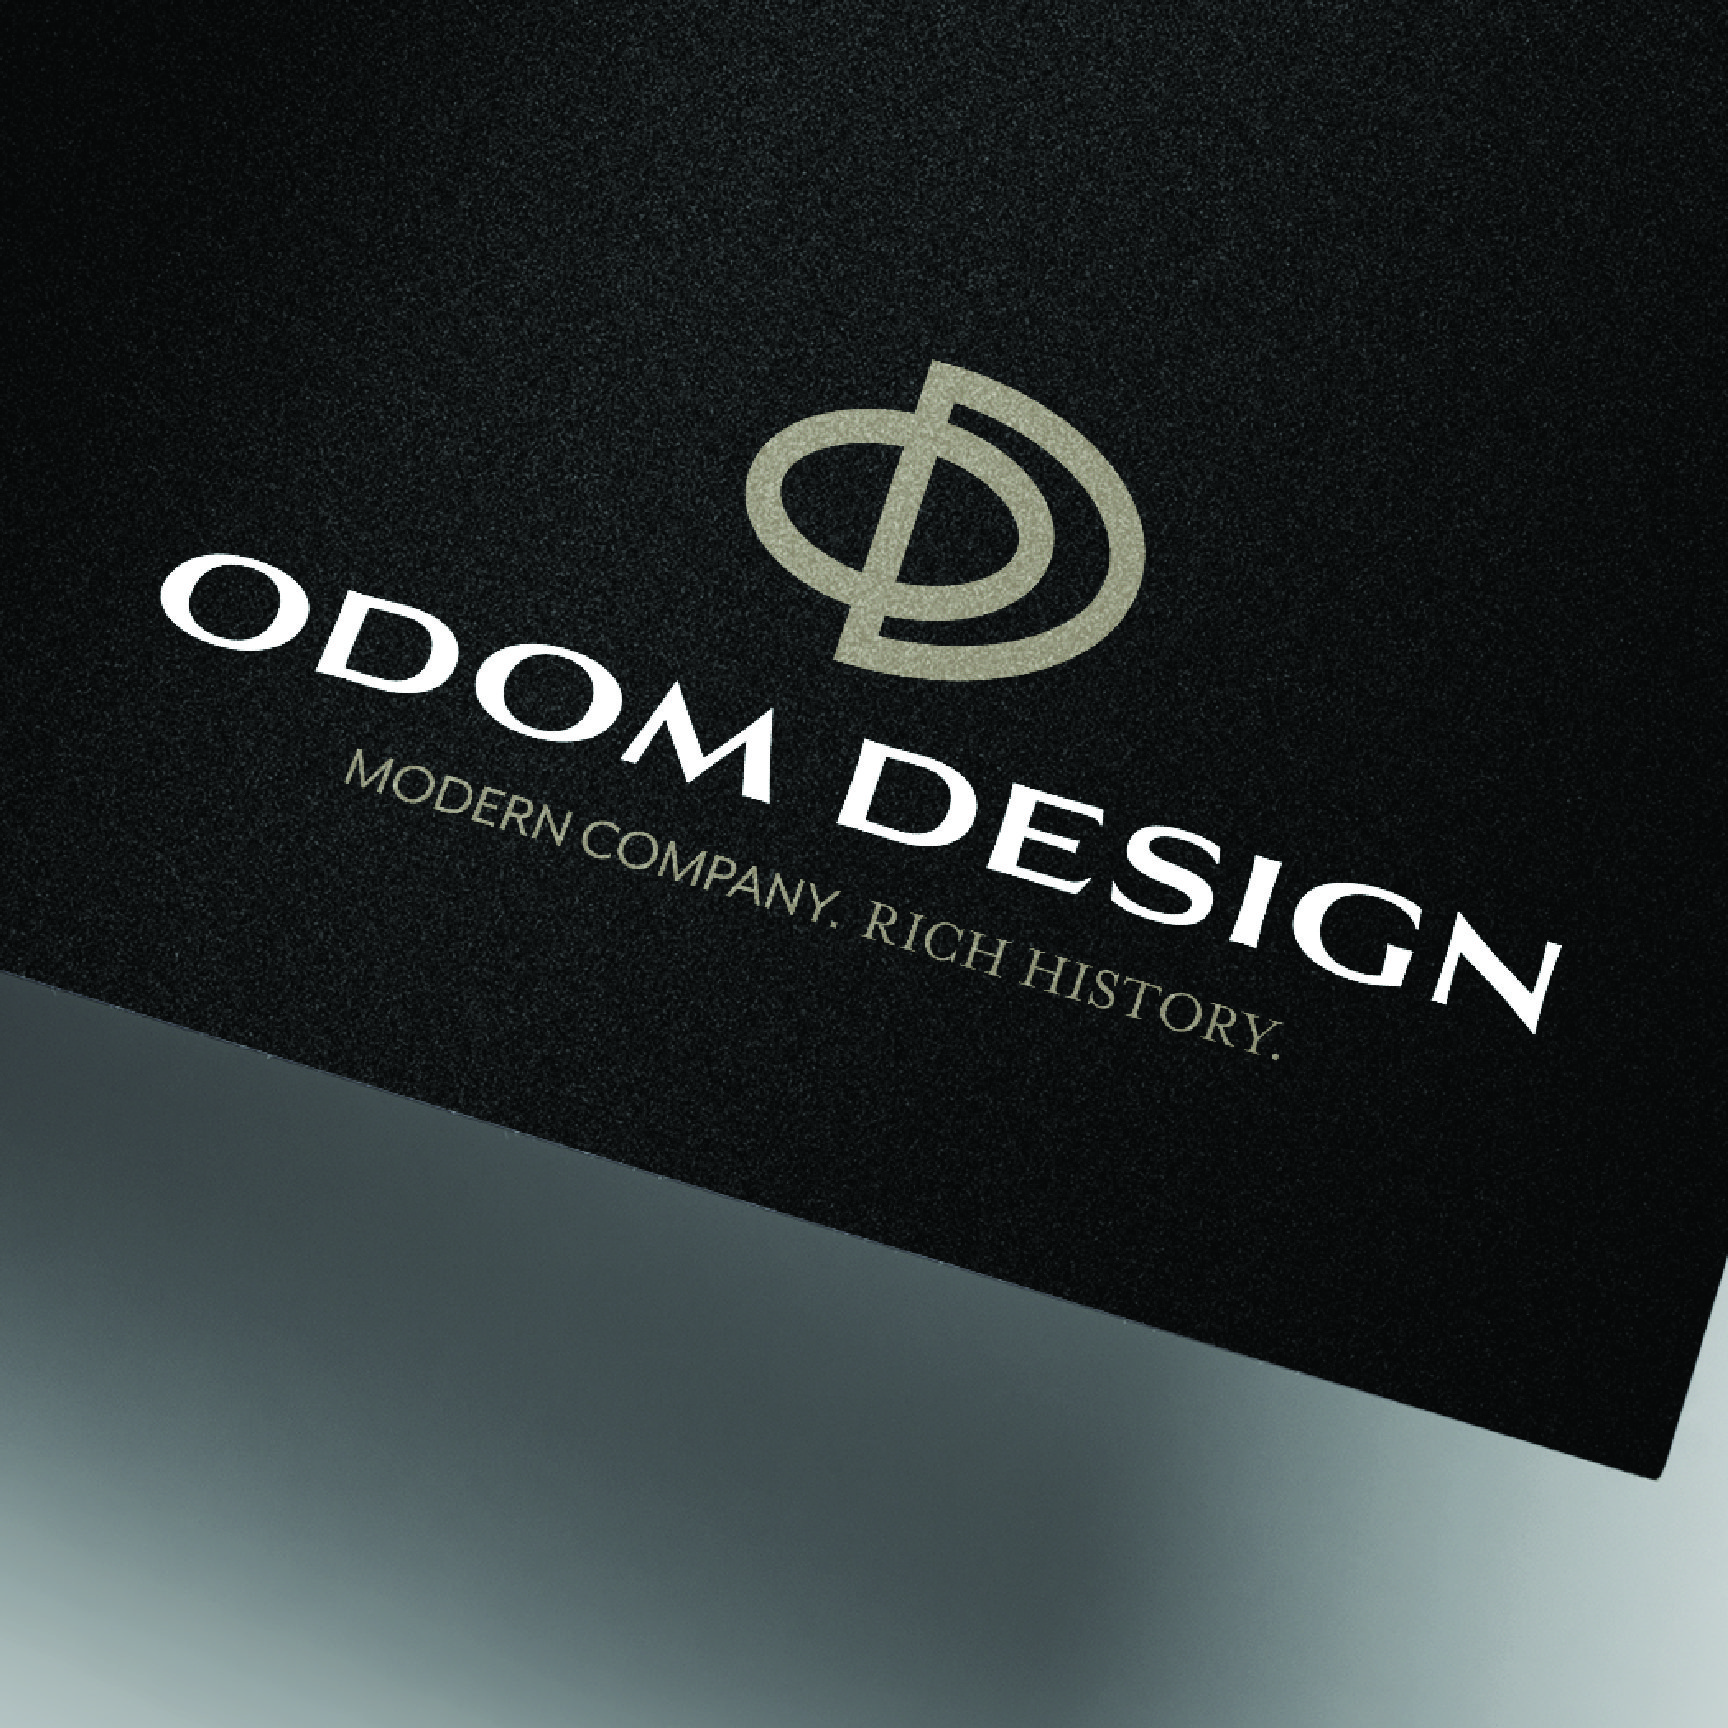 Odom Design Folder Design